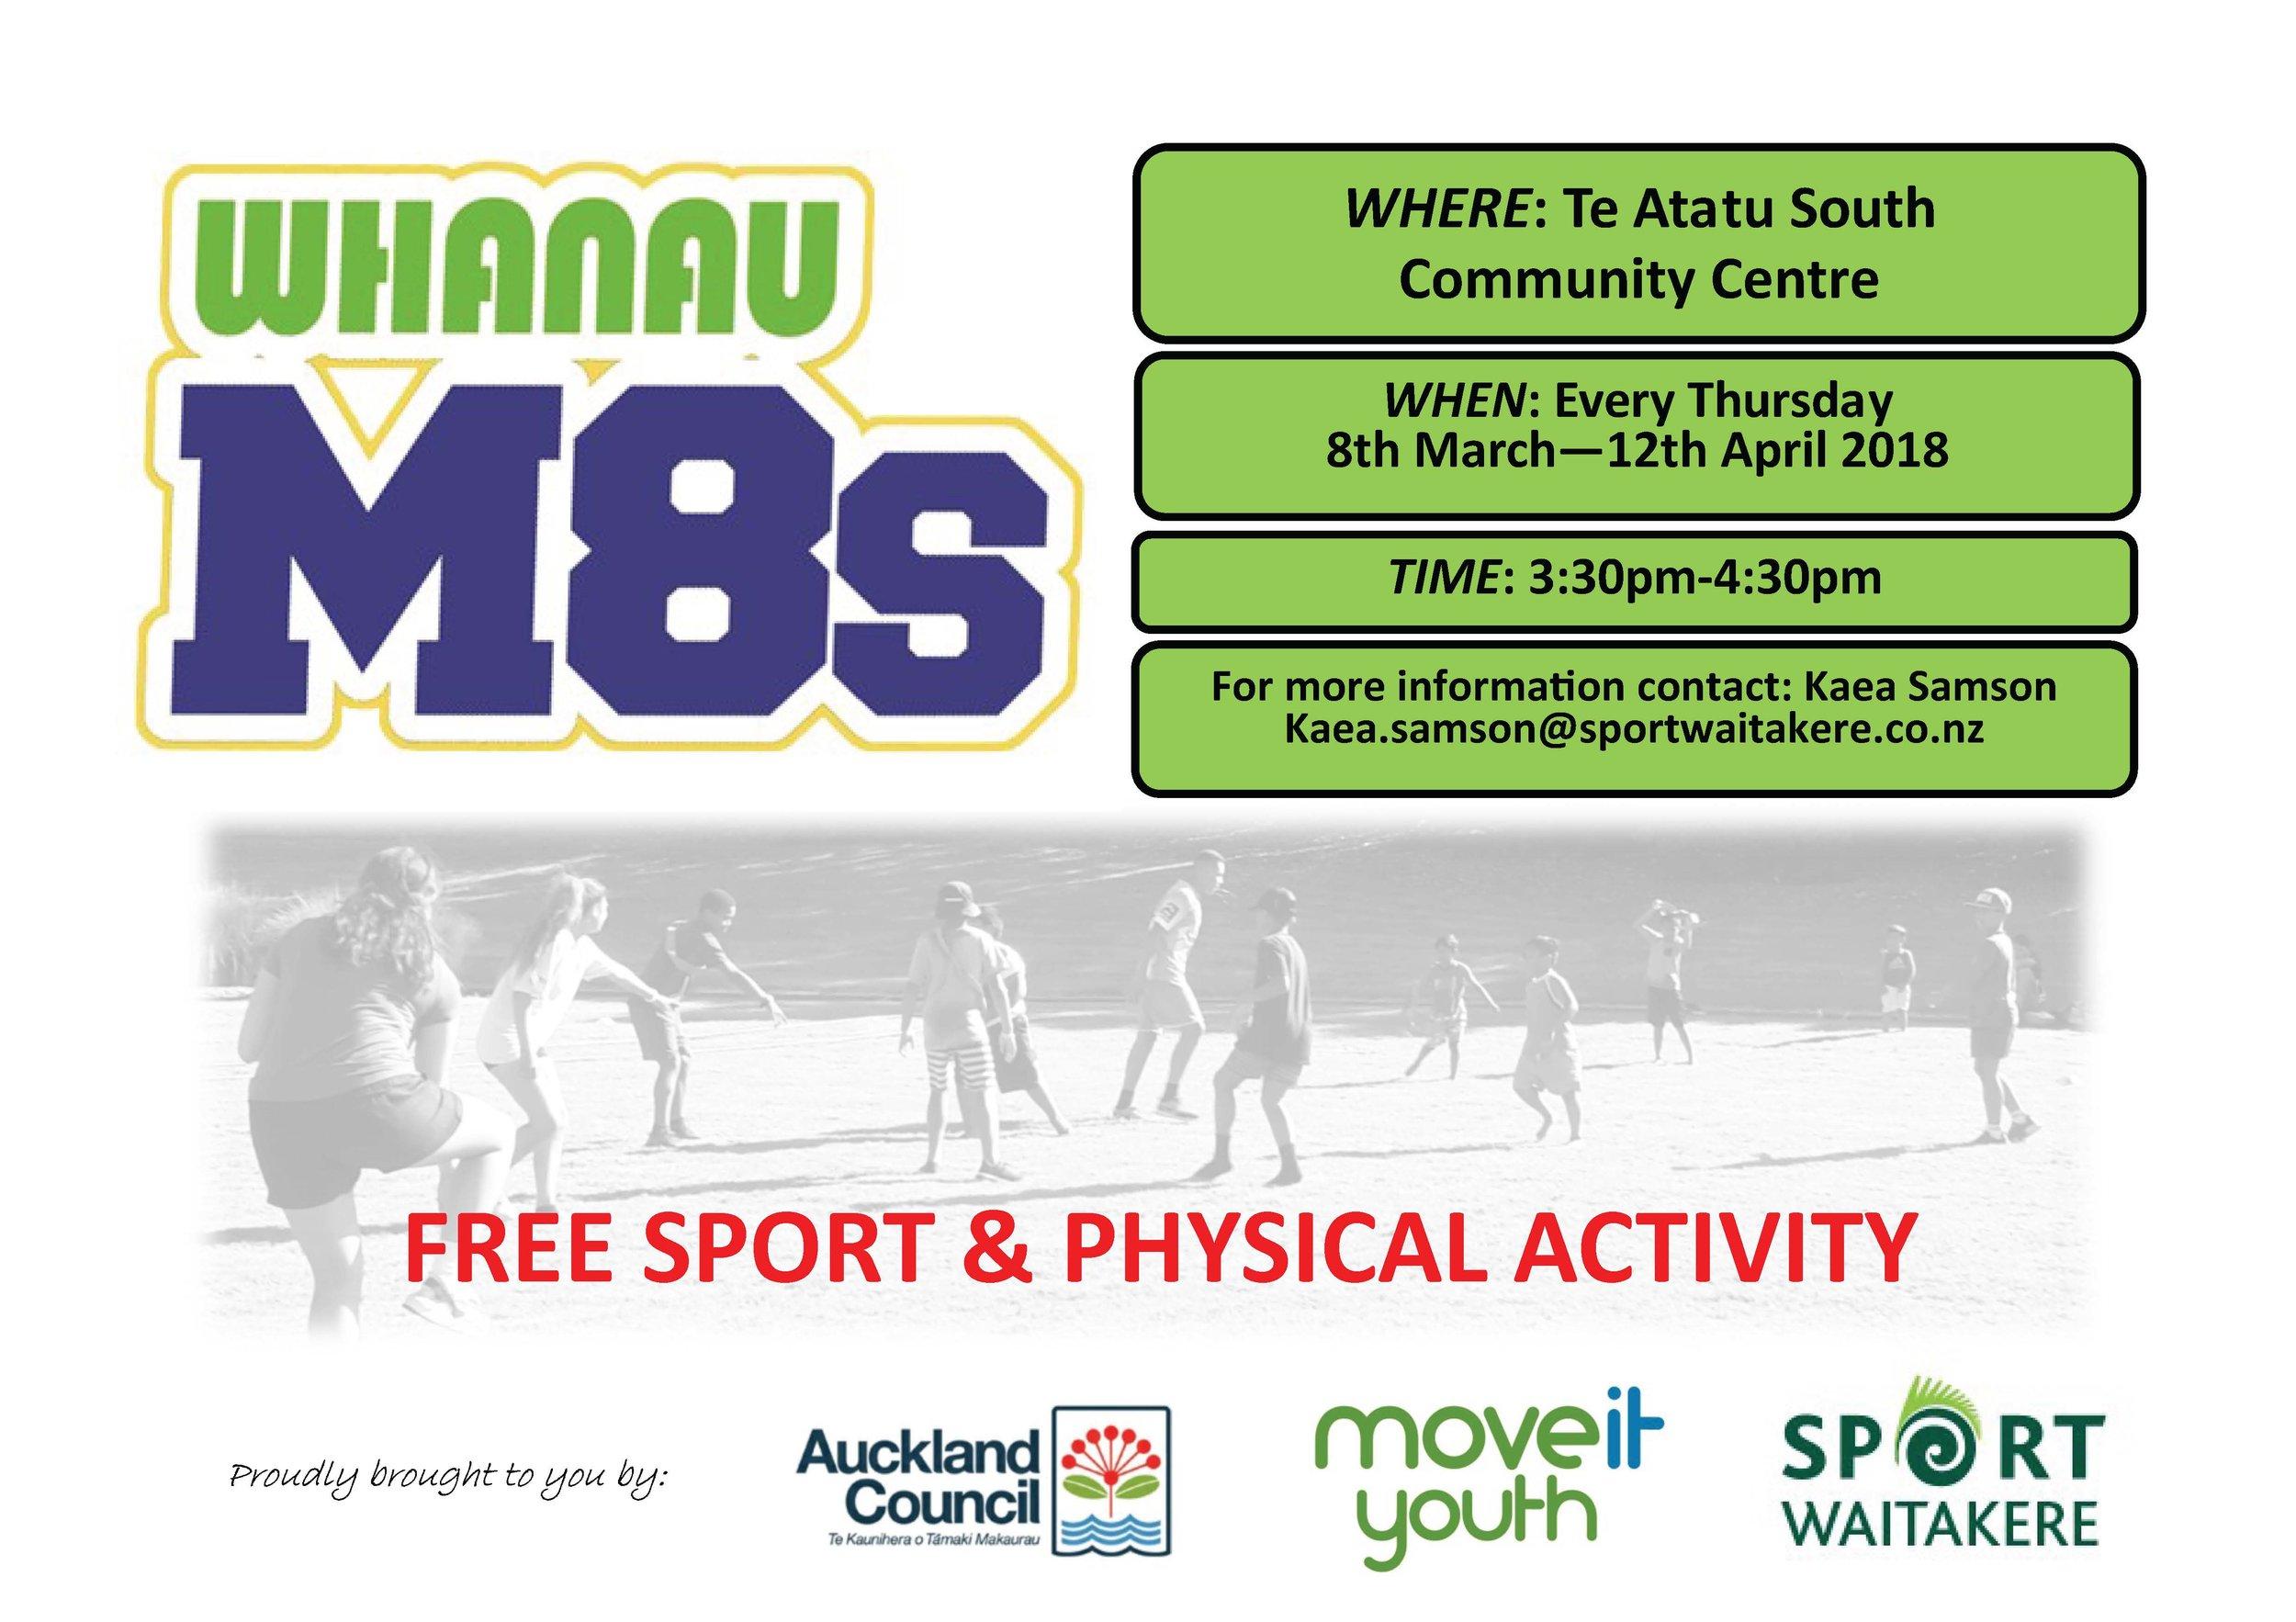 Whanau m8s Flyer - Te Atatu South Community Centre.jpg